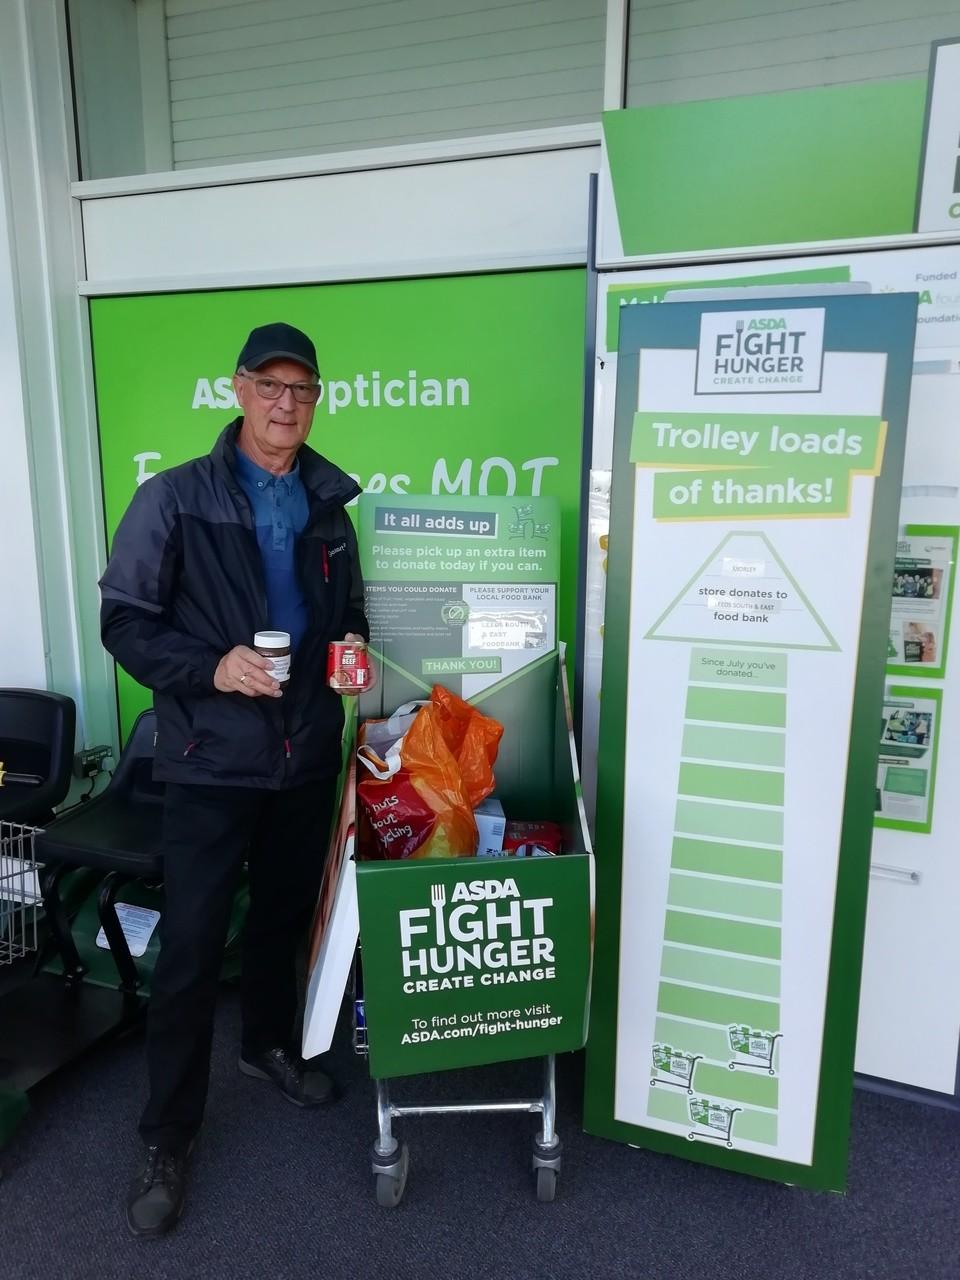 Customer donates to food bank each week | Asda Morley